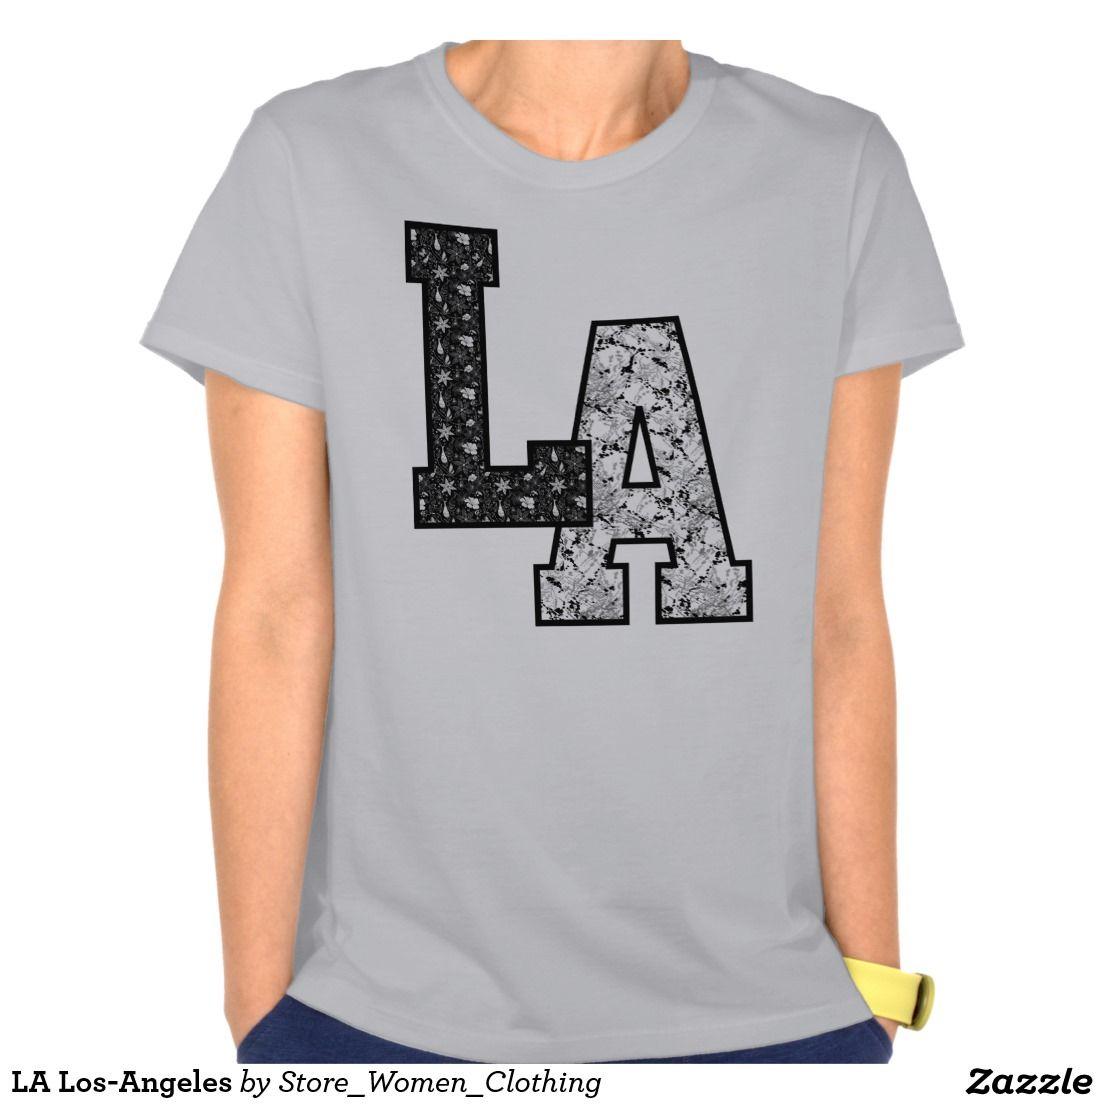 LA Los-Angeles Tee Shirt